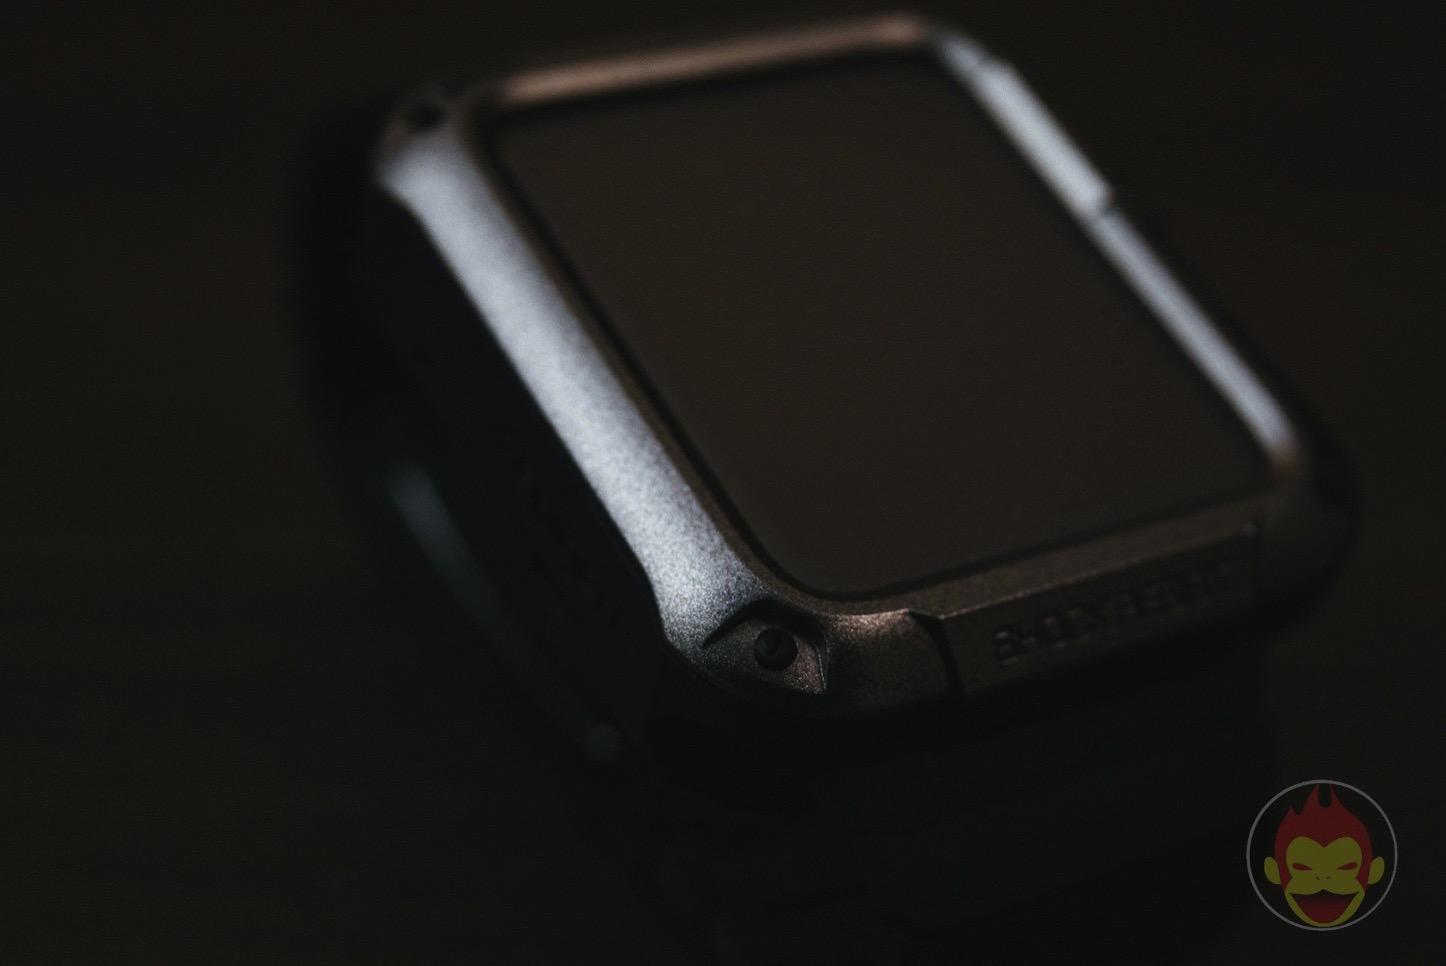 Spigen-Touch-Armor-Apple-Watch-Case-05.jpg